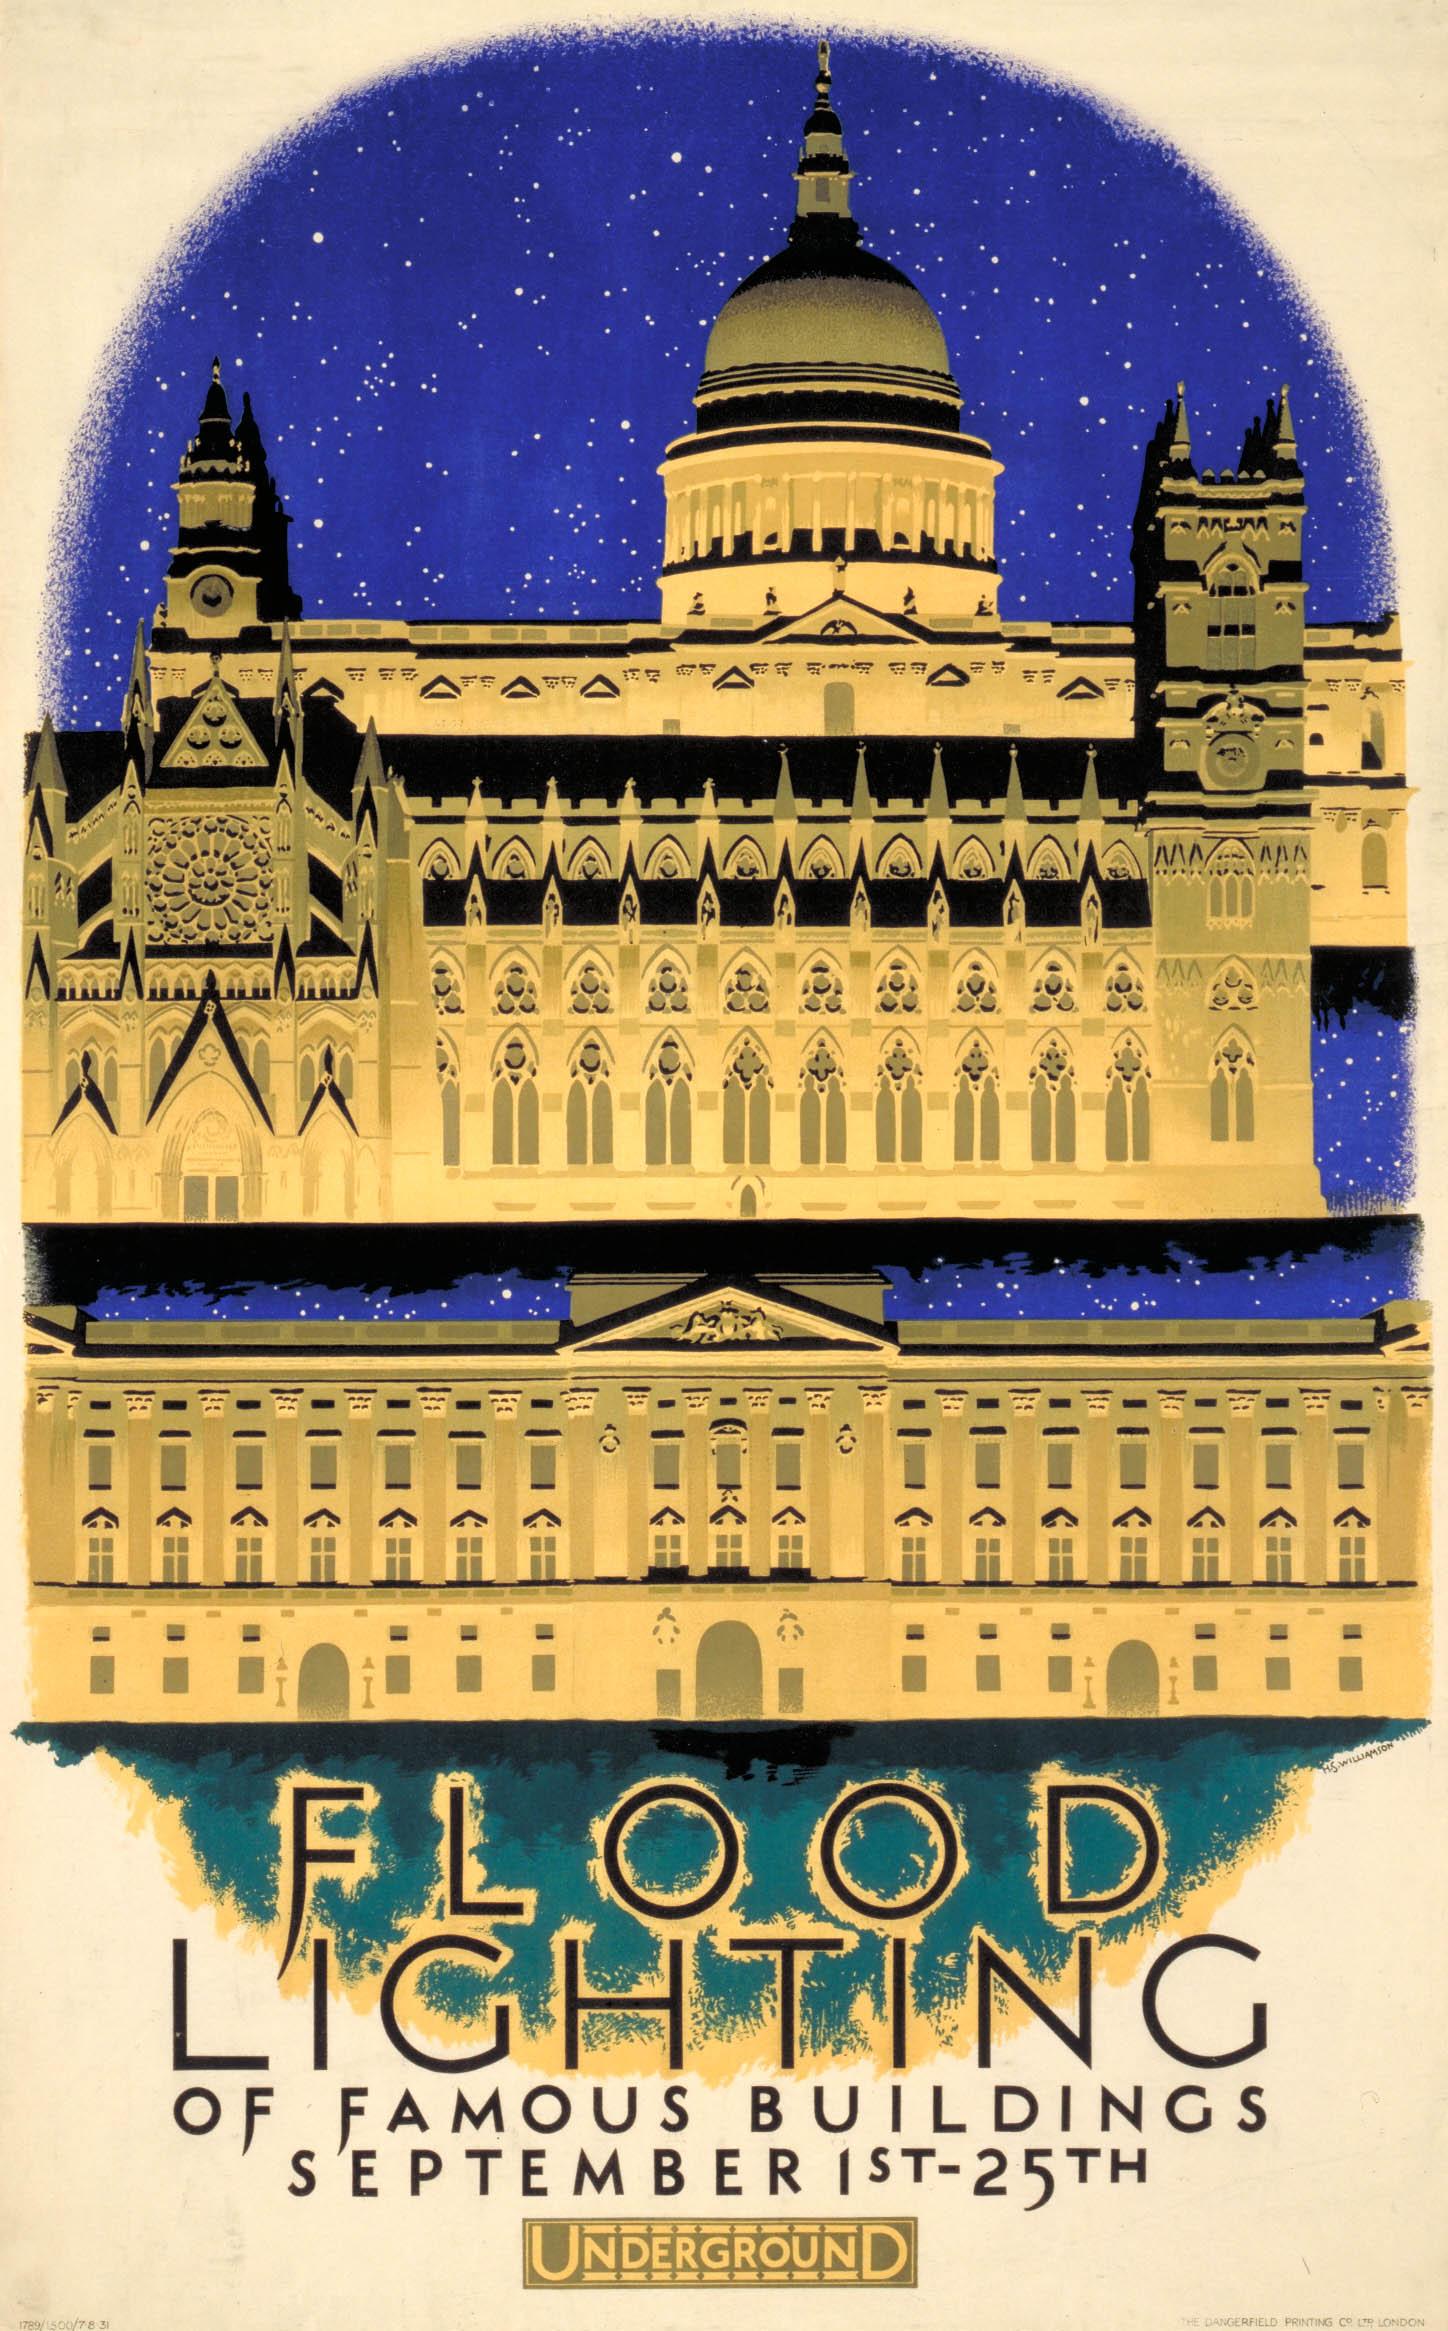 Floodlighting by Harold Sandys Williamson, 1931